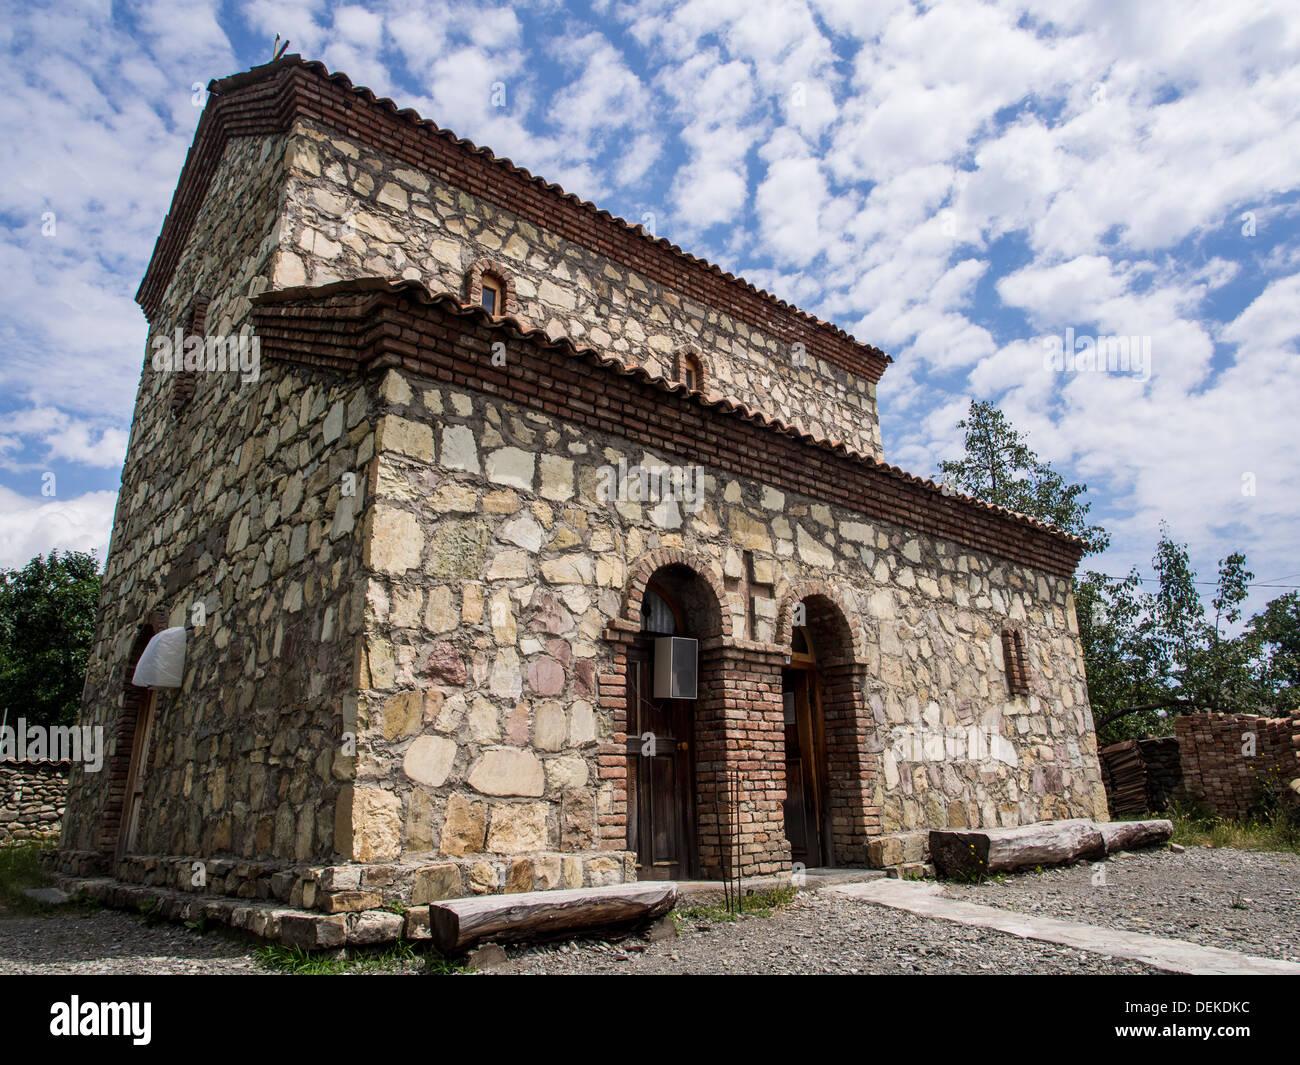 One of small village churches in Georgia, Caucasus. - Stock Image